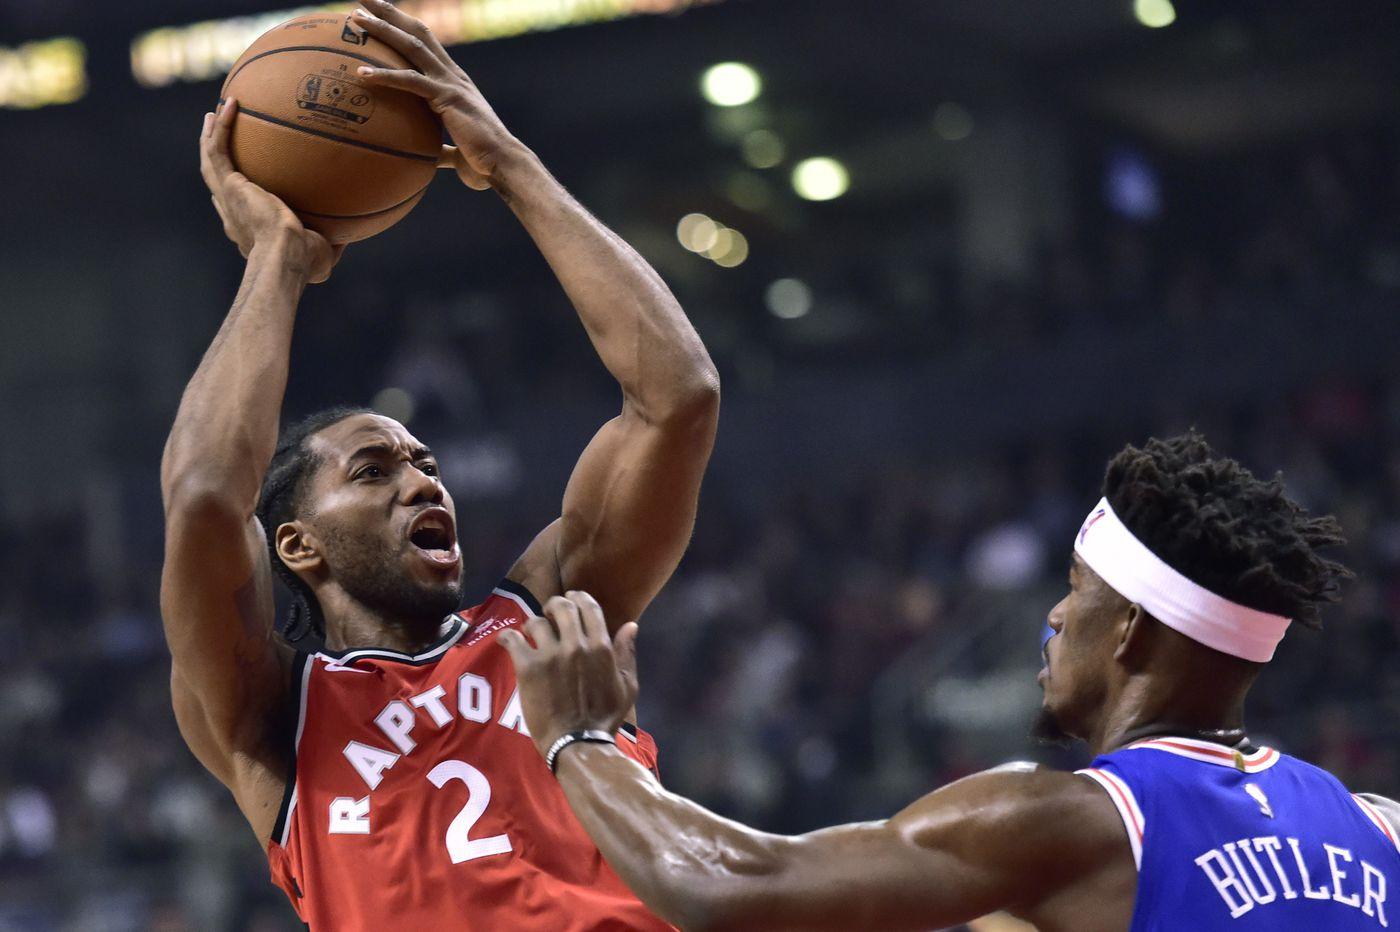 Sixers-Raptors observations: Joel Embiid's struggles, team's lack of depth, defensive mismatches